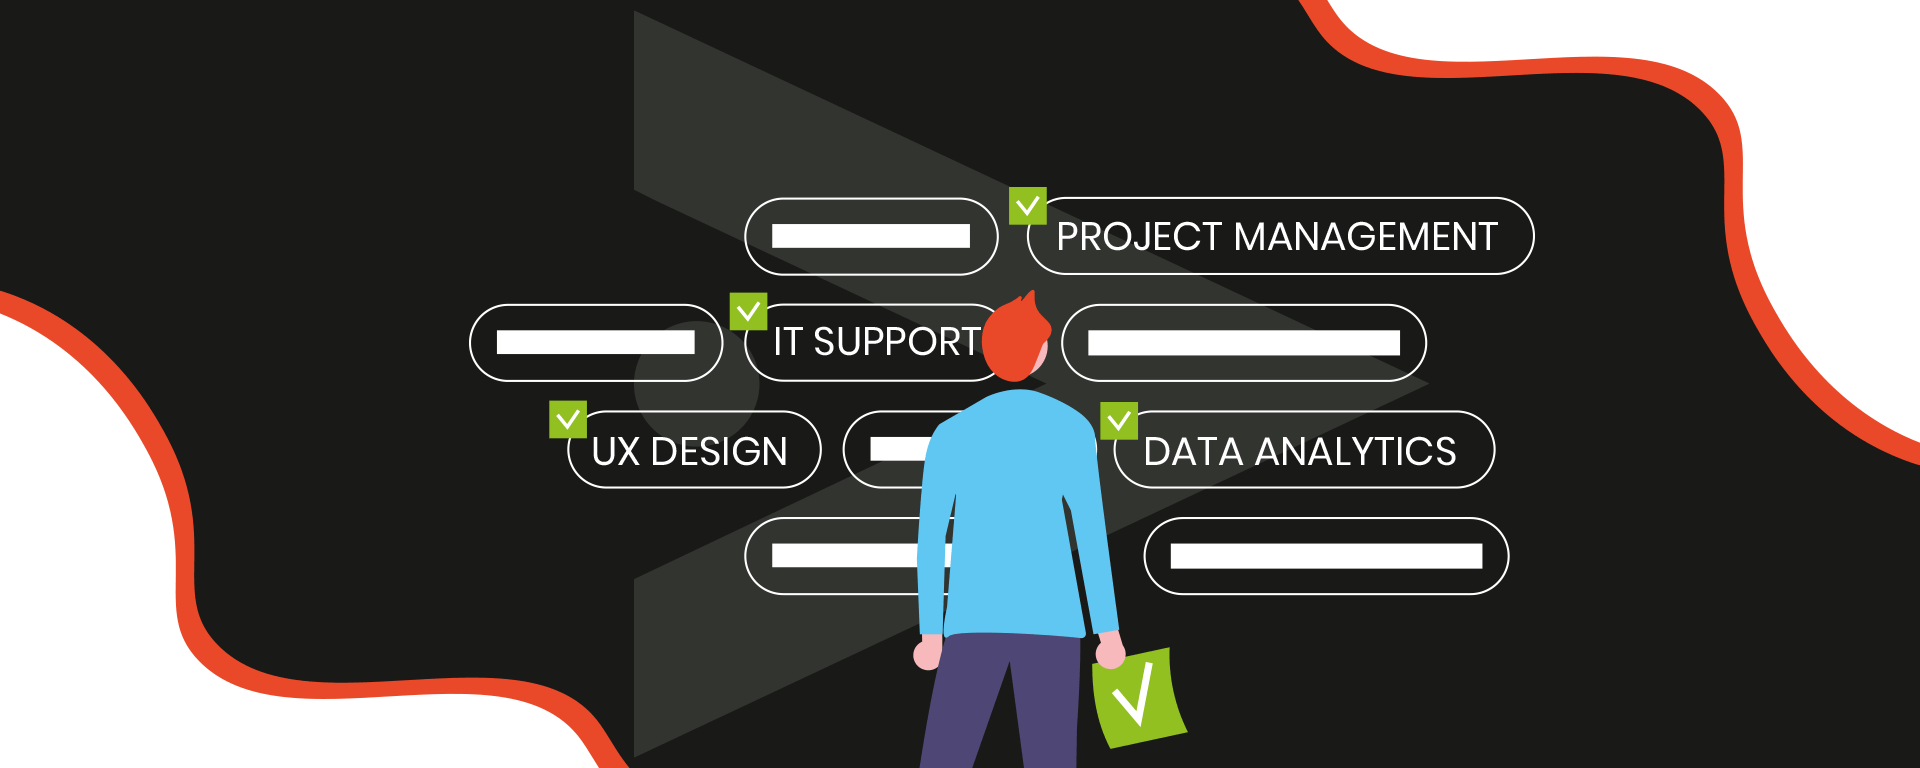 IAA_IT__Ux_ProjectManagement_DataAnalytics_google_coursera